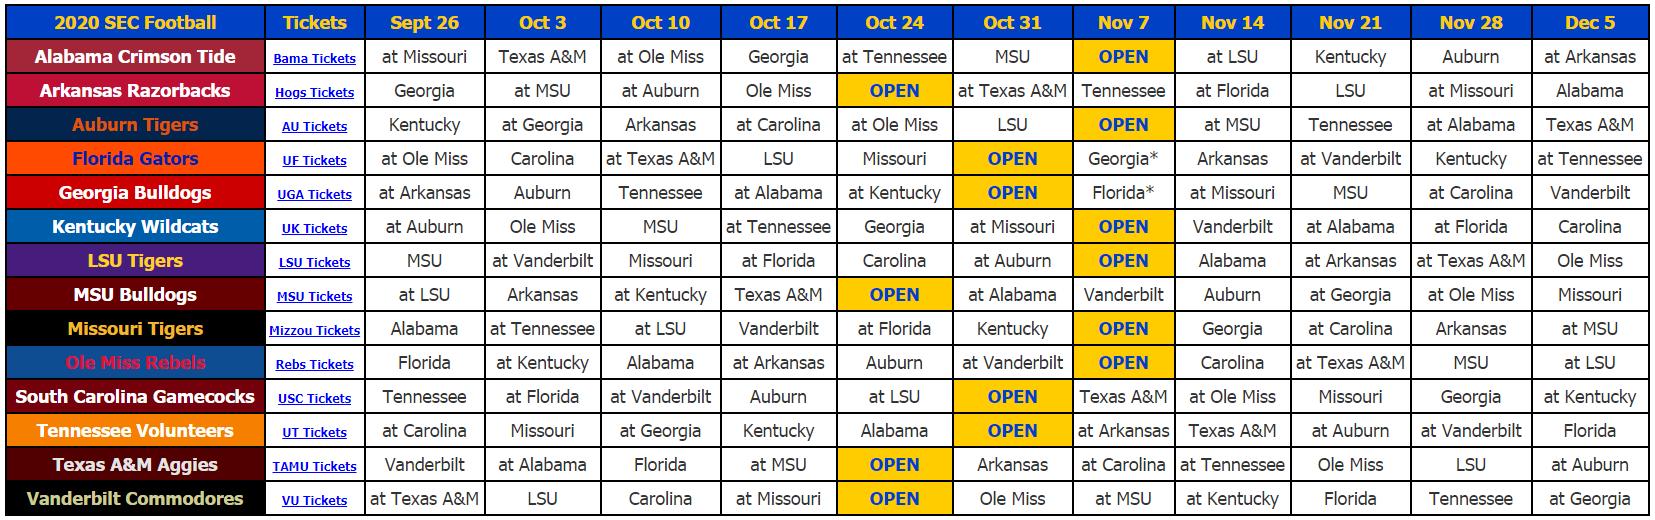 2020 SEC Football Schedule Covid 19